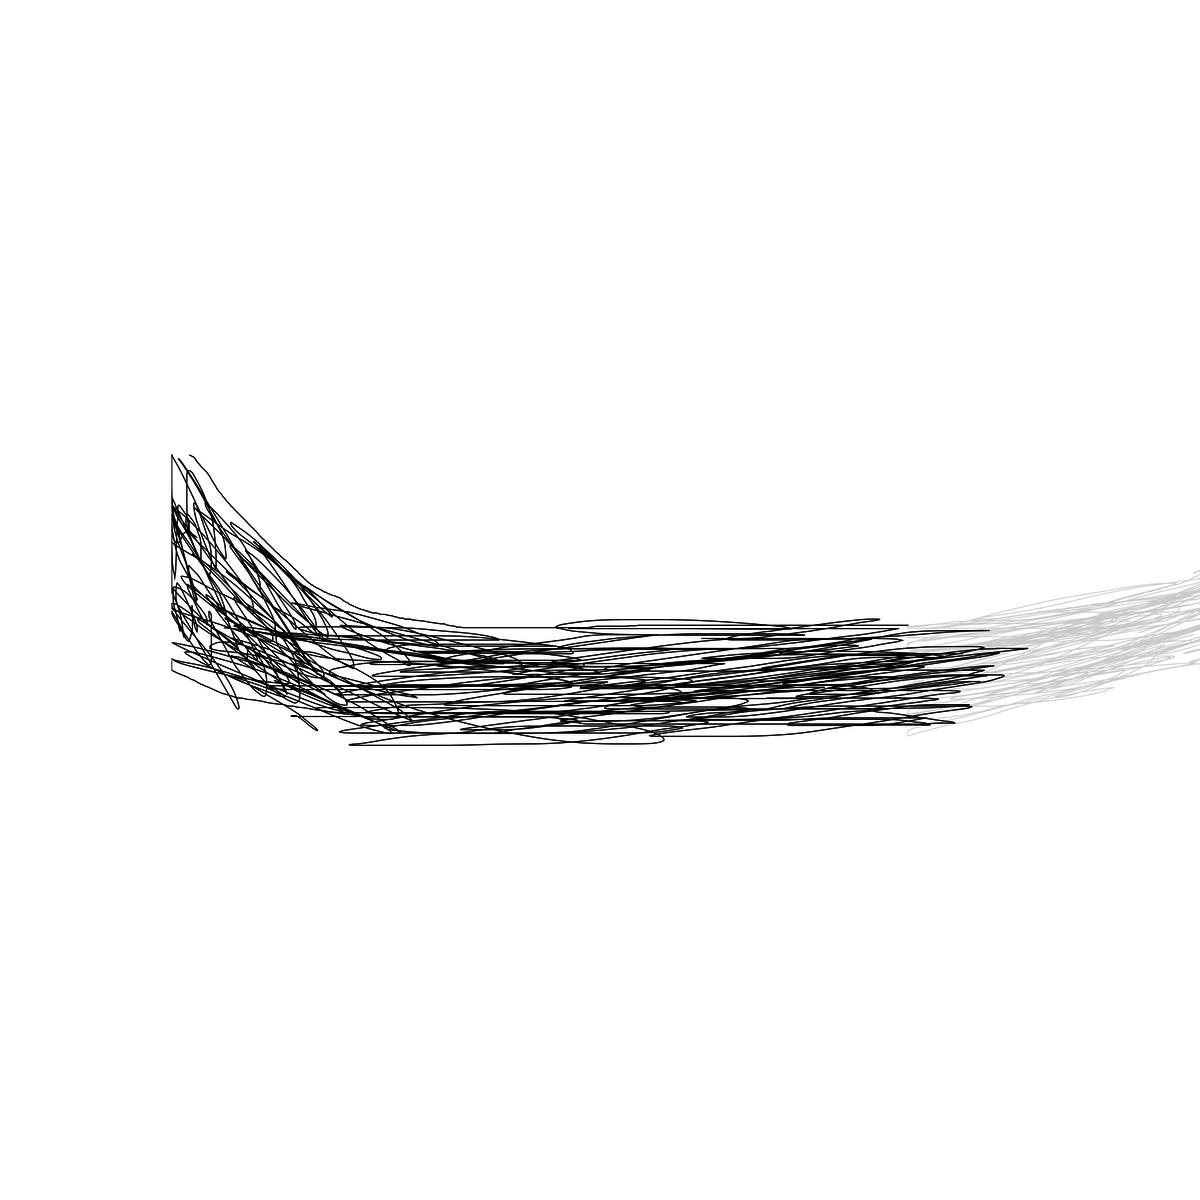 BAAAM drawing#11420 lat:52.4758567810058600lng: 13.4057073593139650